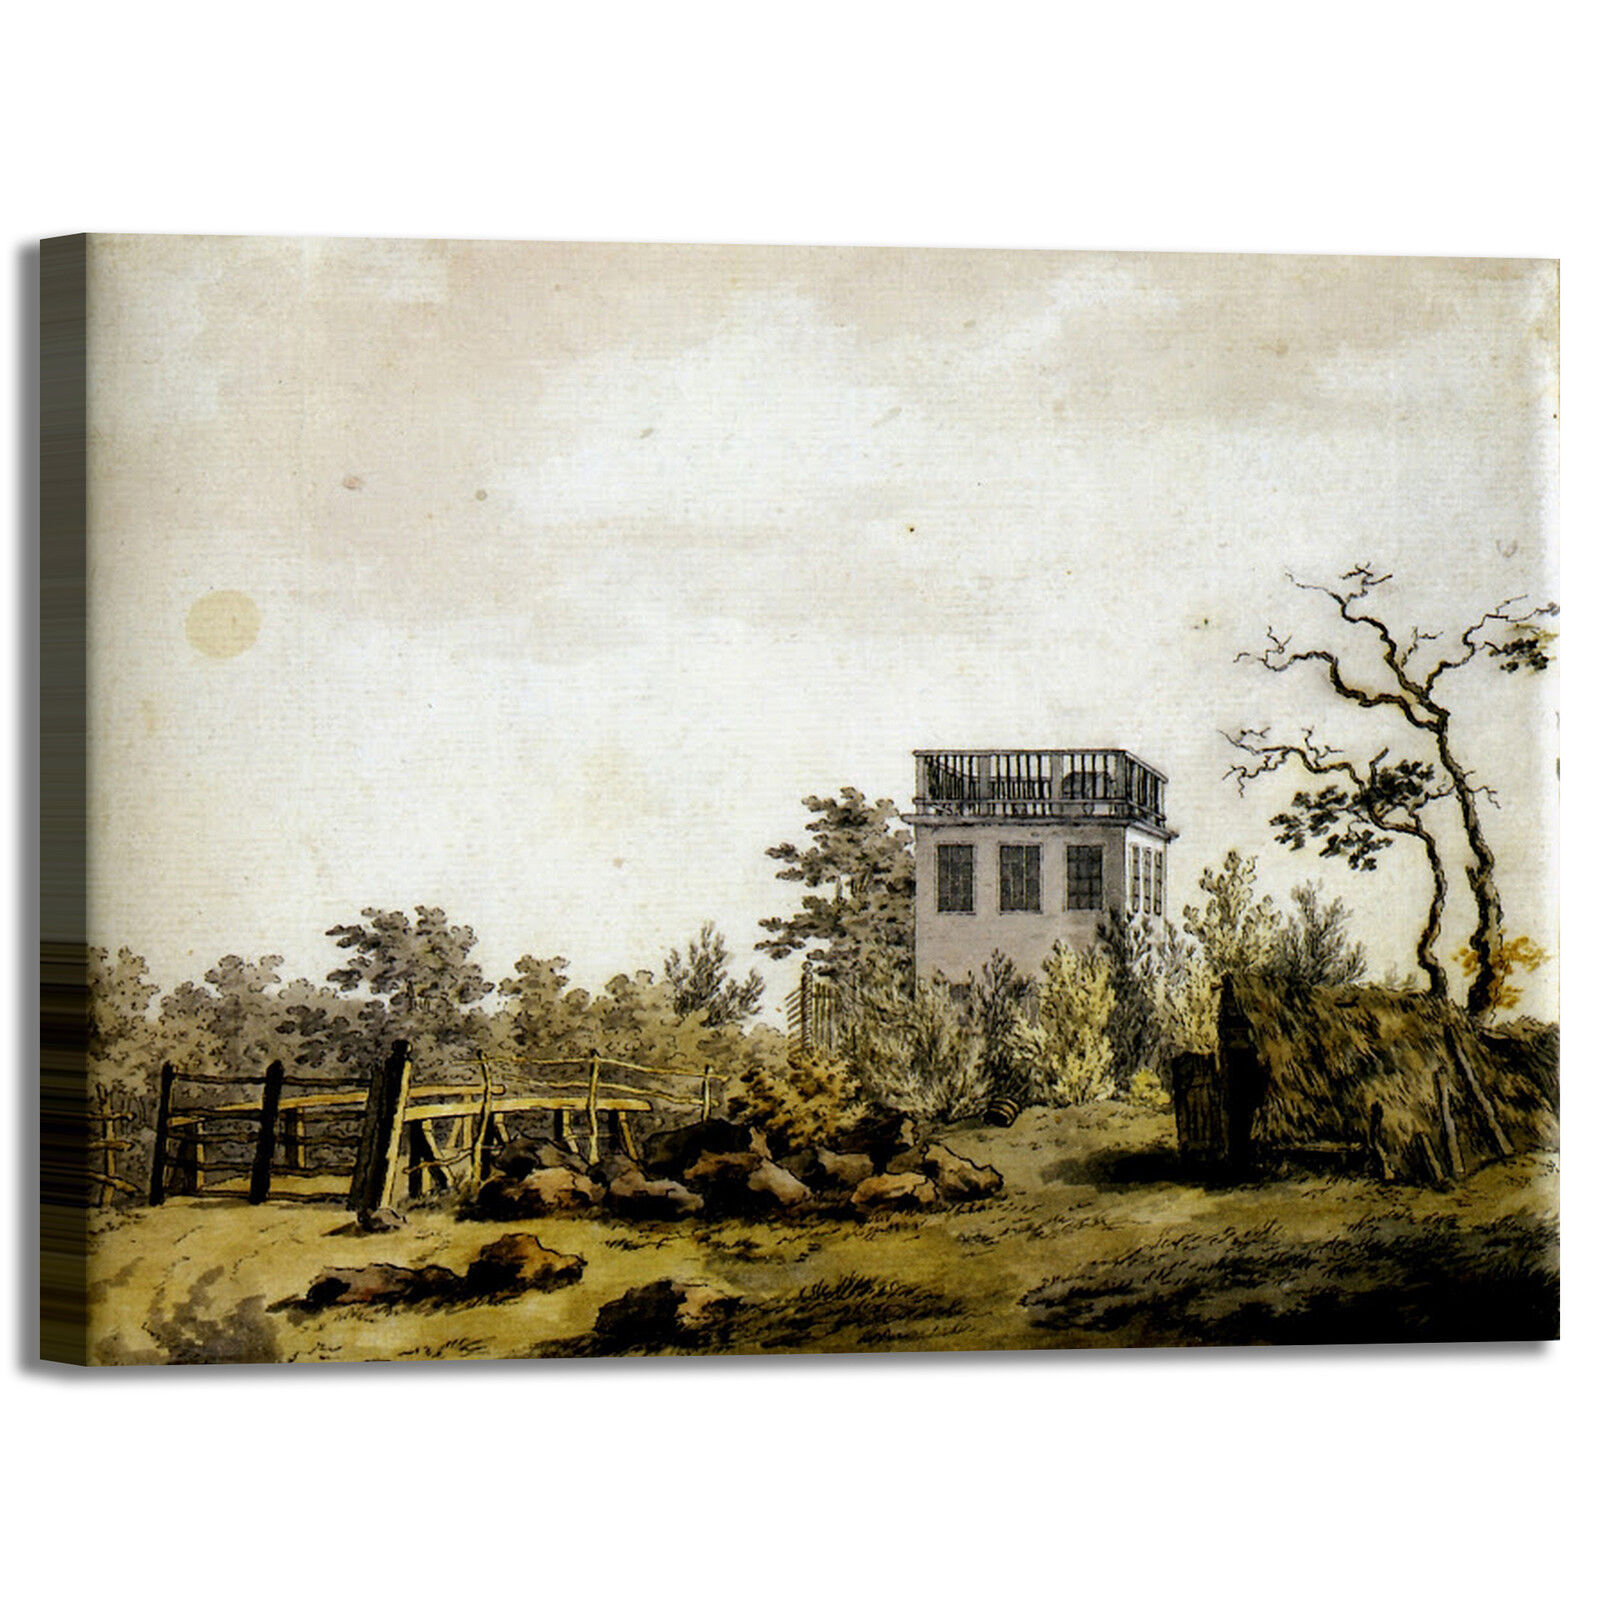 Caspar paesaggio con padiglione quadro stampa tela dipinto telaio arrossoo casa